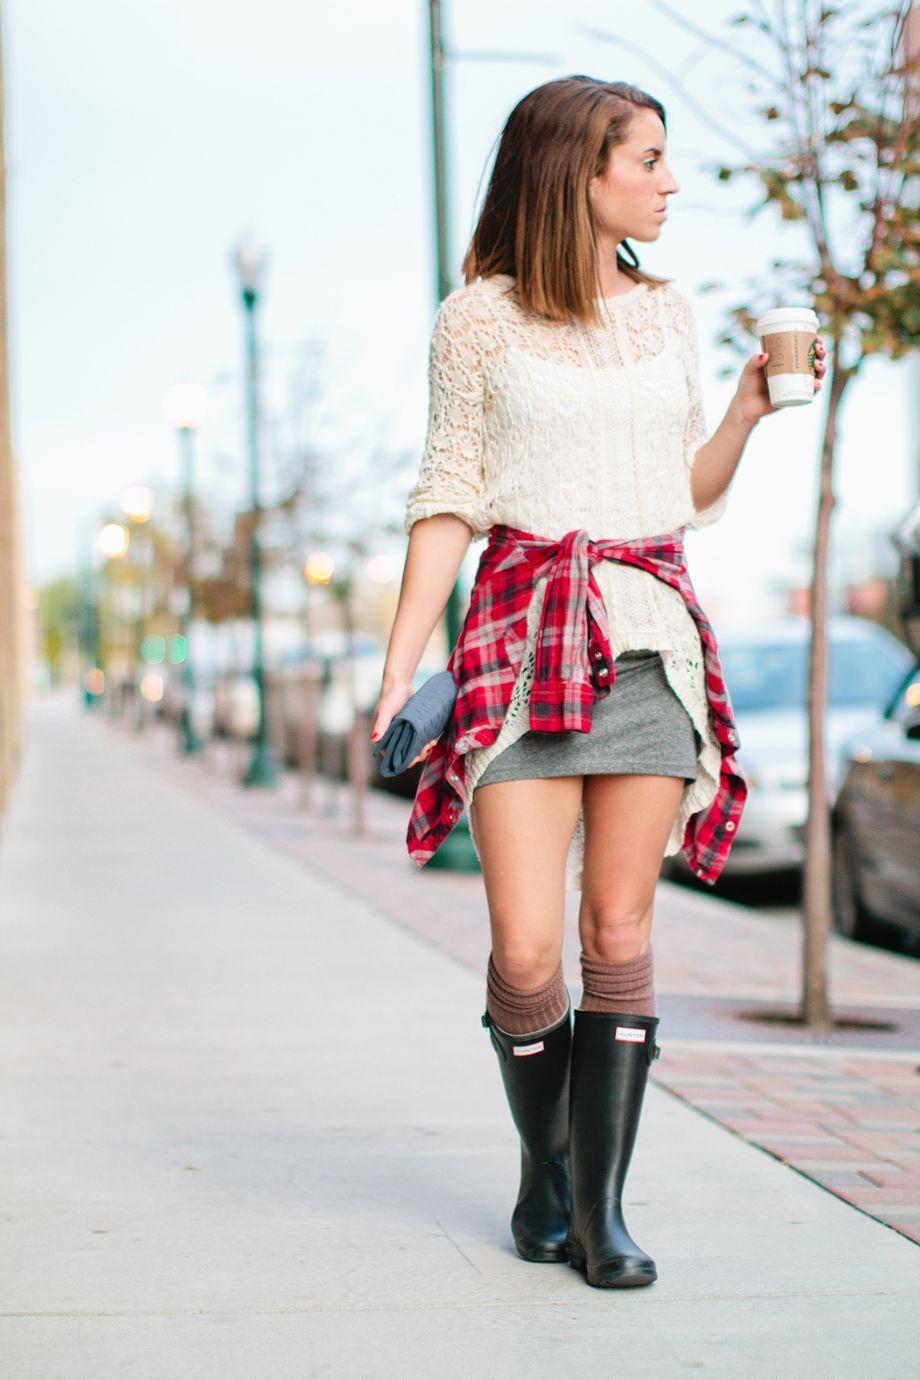 Get the look: Lace Shirt [TJ Maxx] Plaid Shirt [Forever 21] Mini Skirt [H&M] Rain Boots [Hunters] Thigh High Socks [Bonanza]